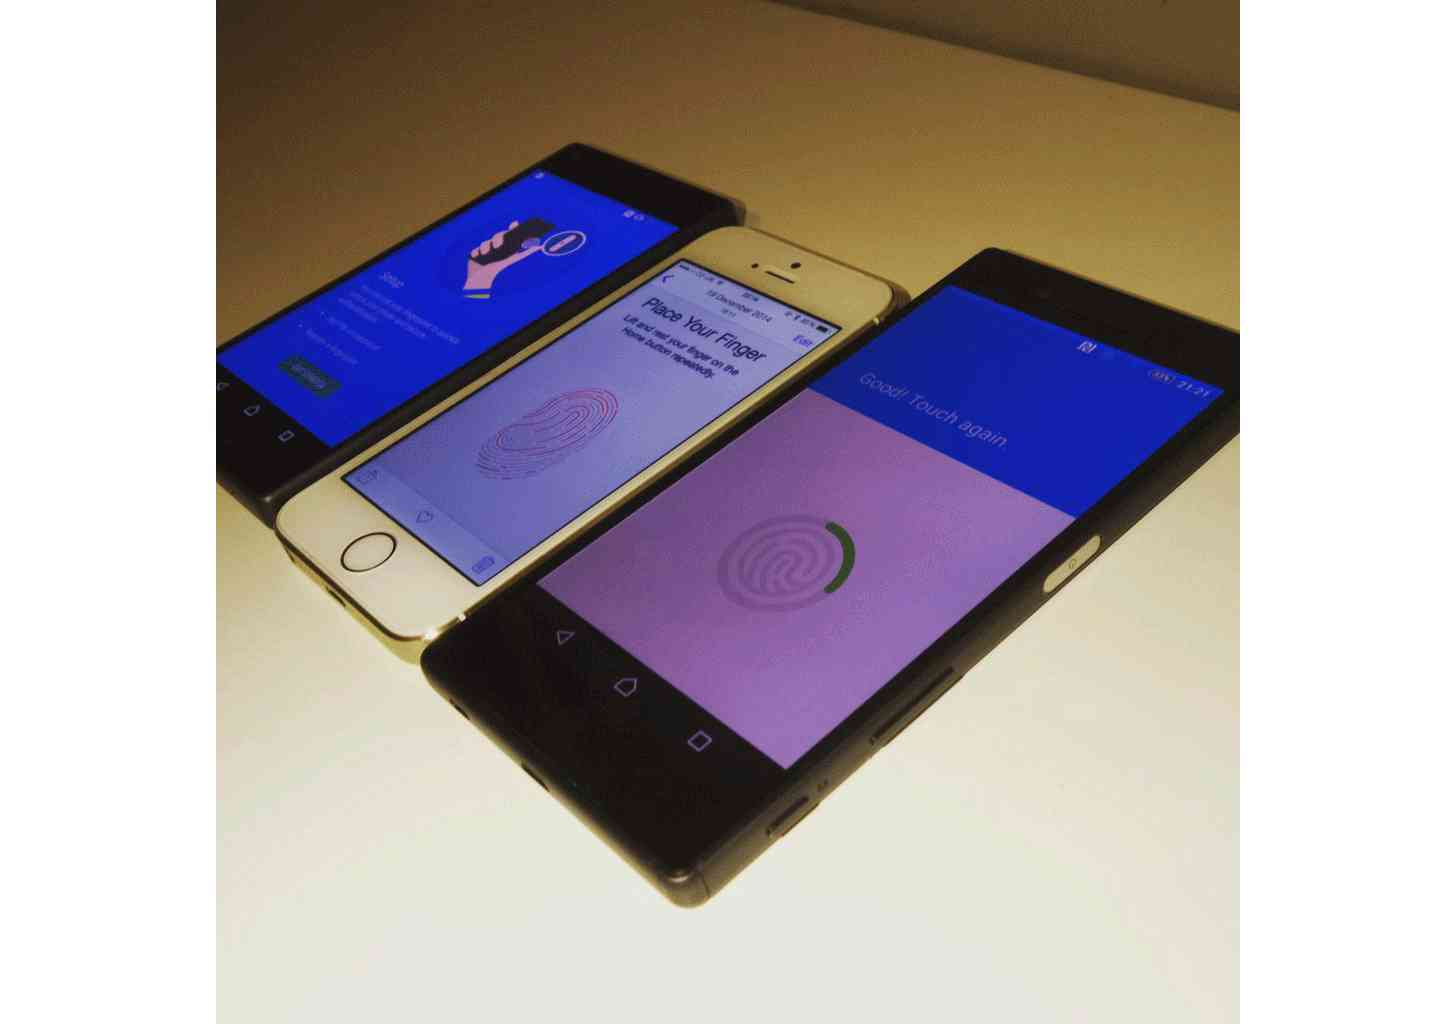 Sony Xperia Z5, Z5 Compact fingerprint reader large